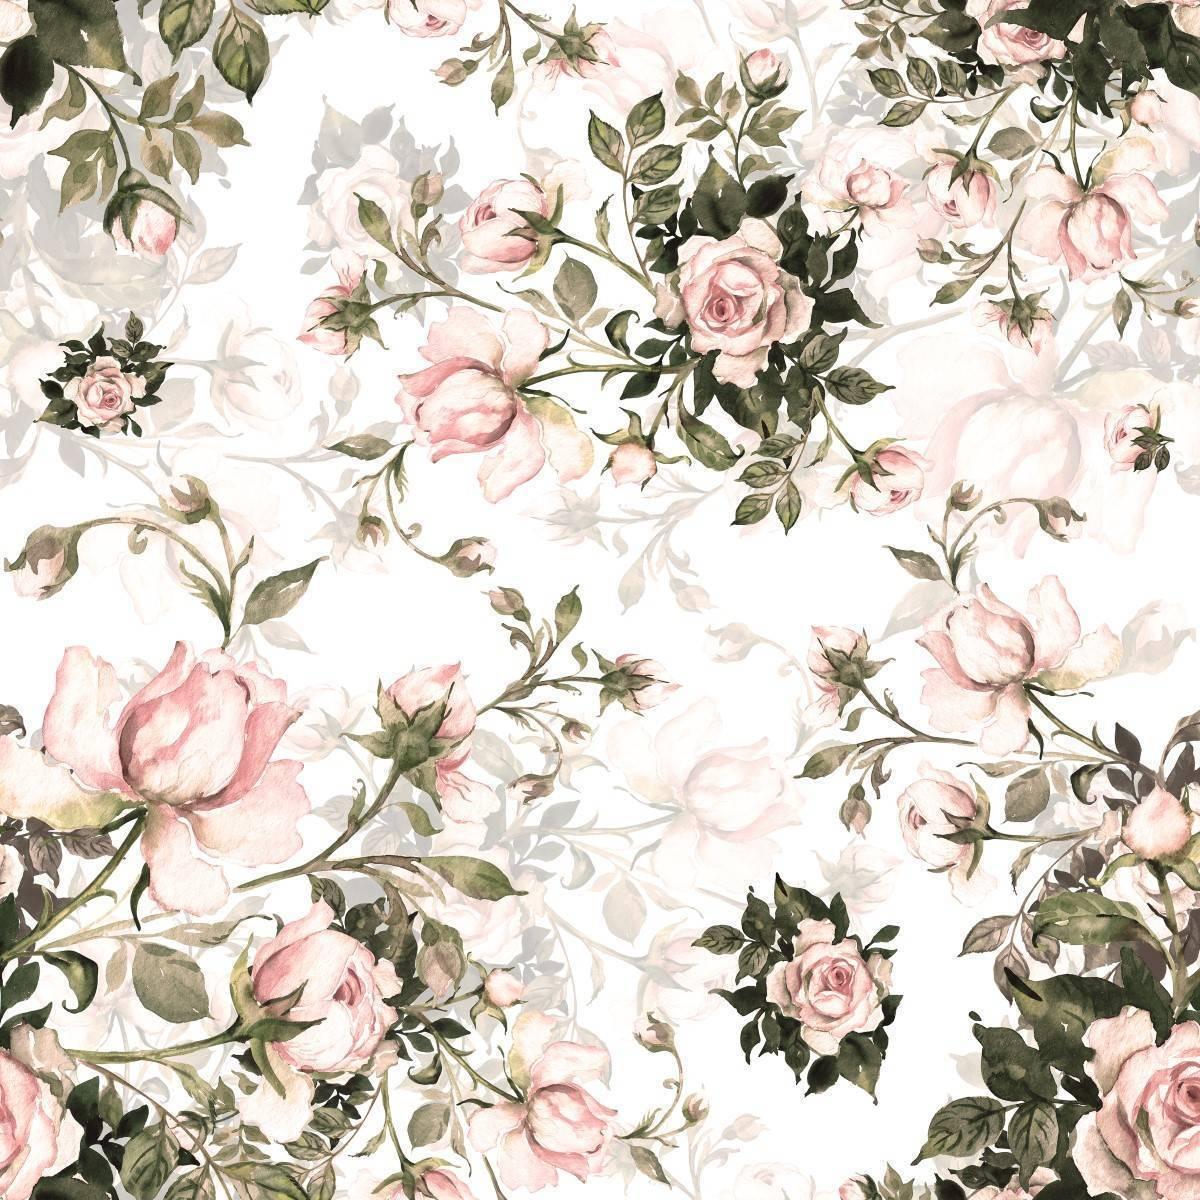 Papel de Parede Rosas | m² imagem 2